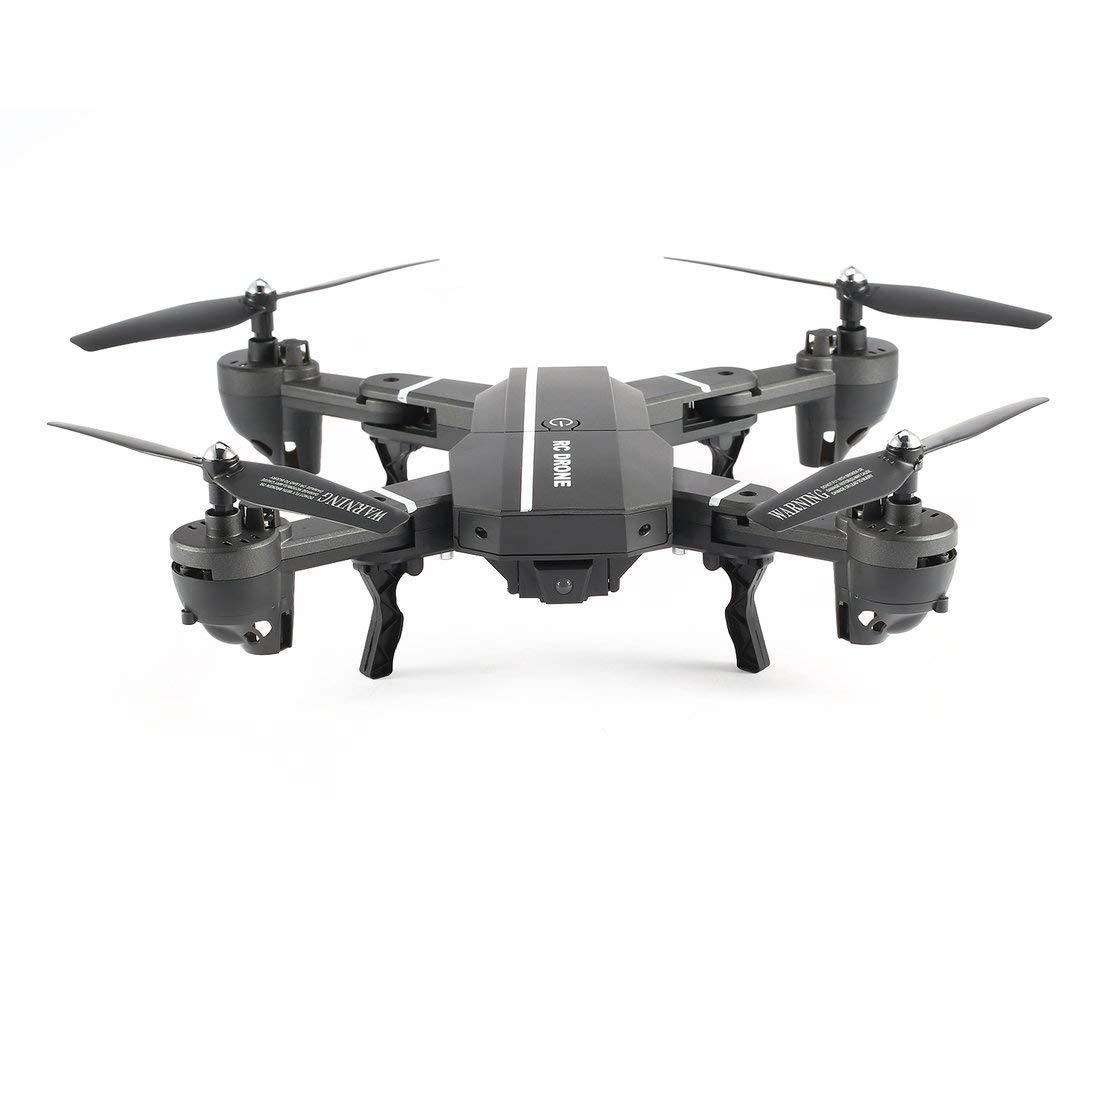 Laurelmartina 8807W 2.4G FPV abejón Plegable Smart RC Quadcopter ...